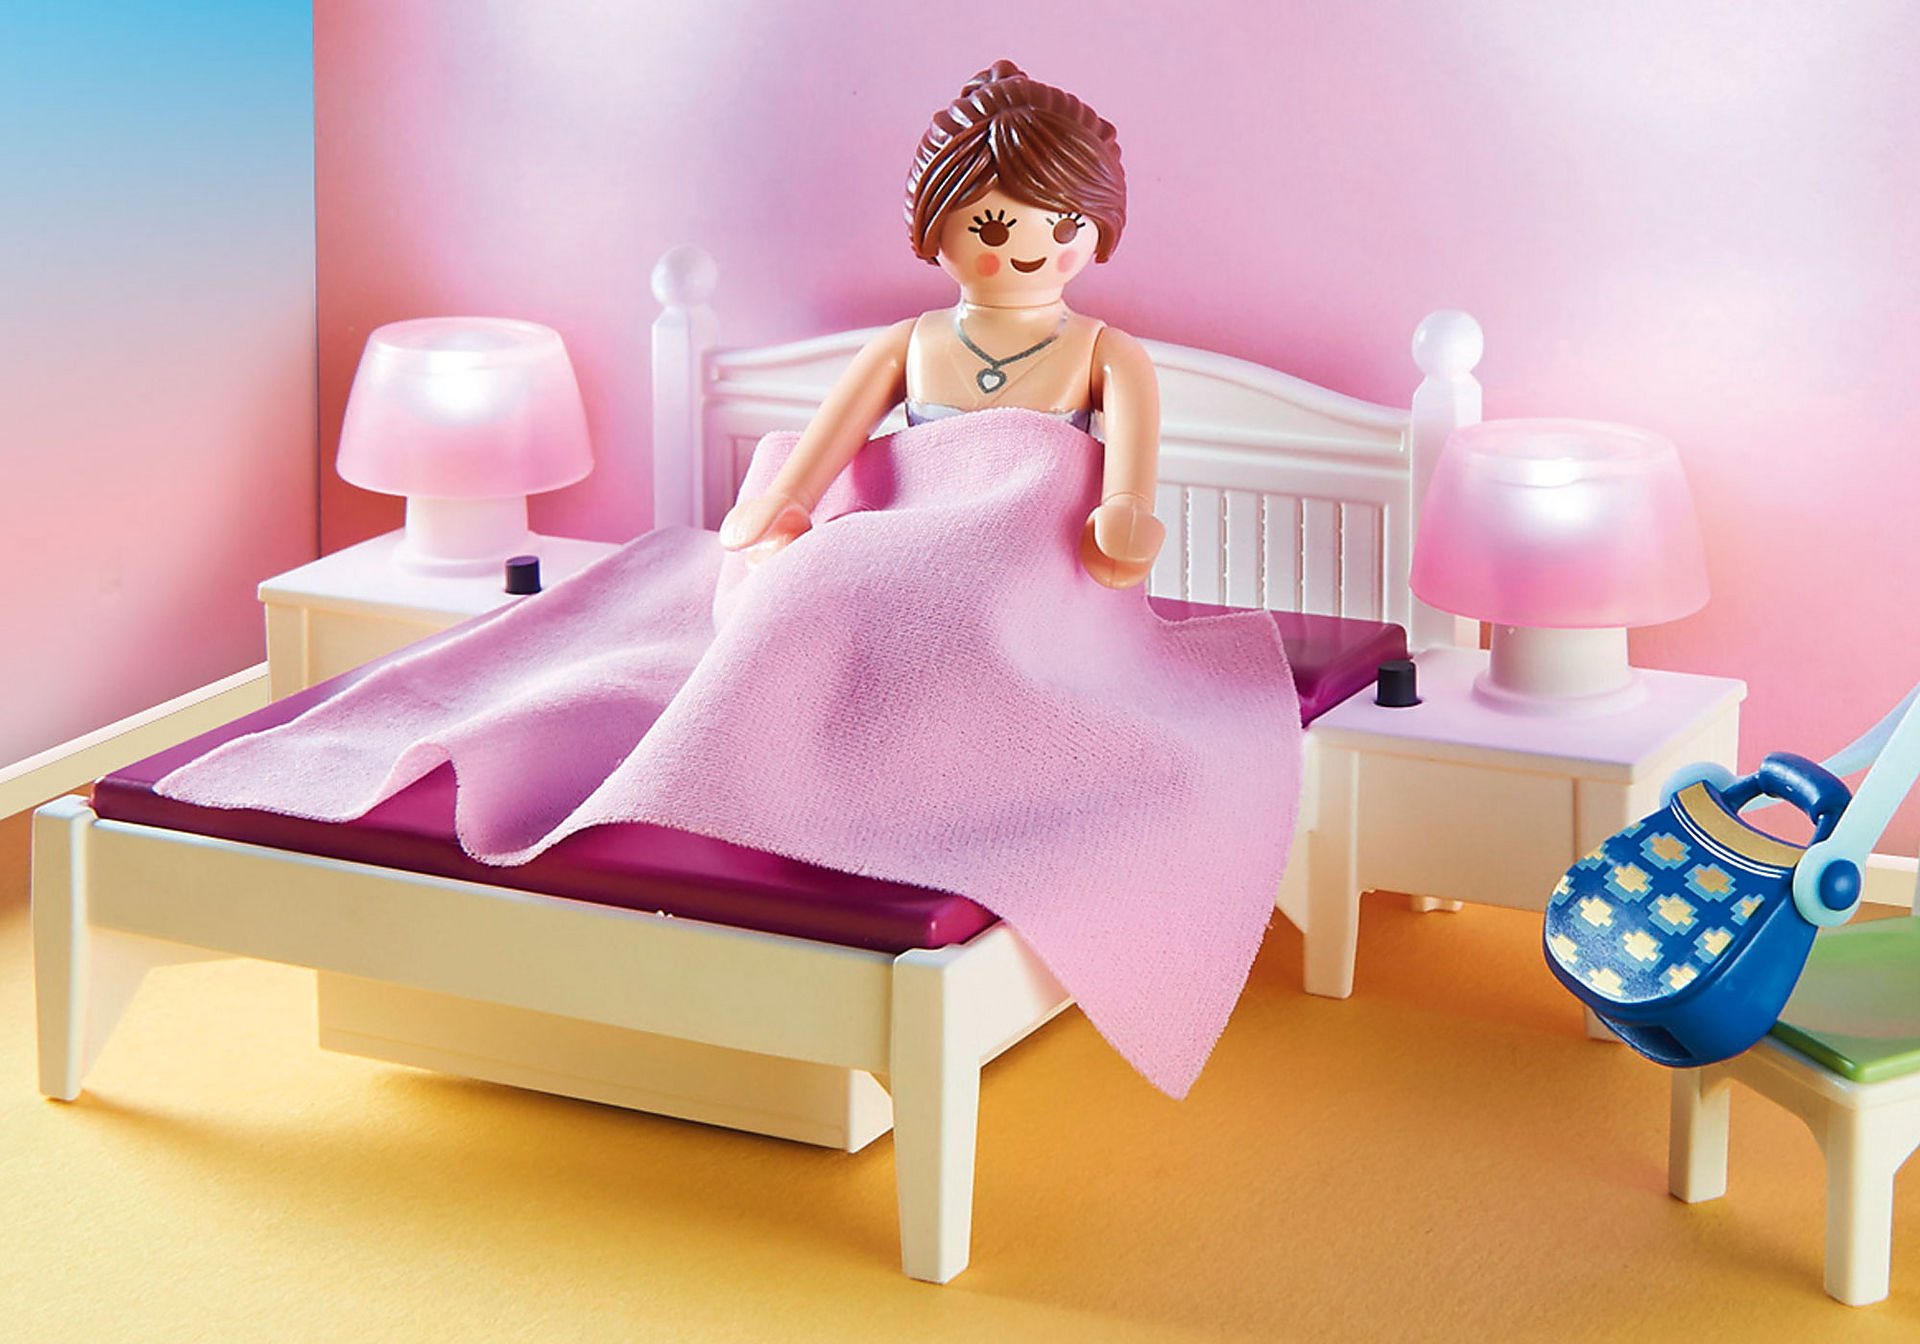 70208 Bedroom with Sewing Corner zoom image4